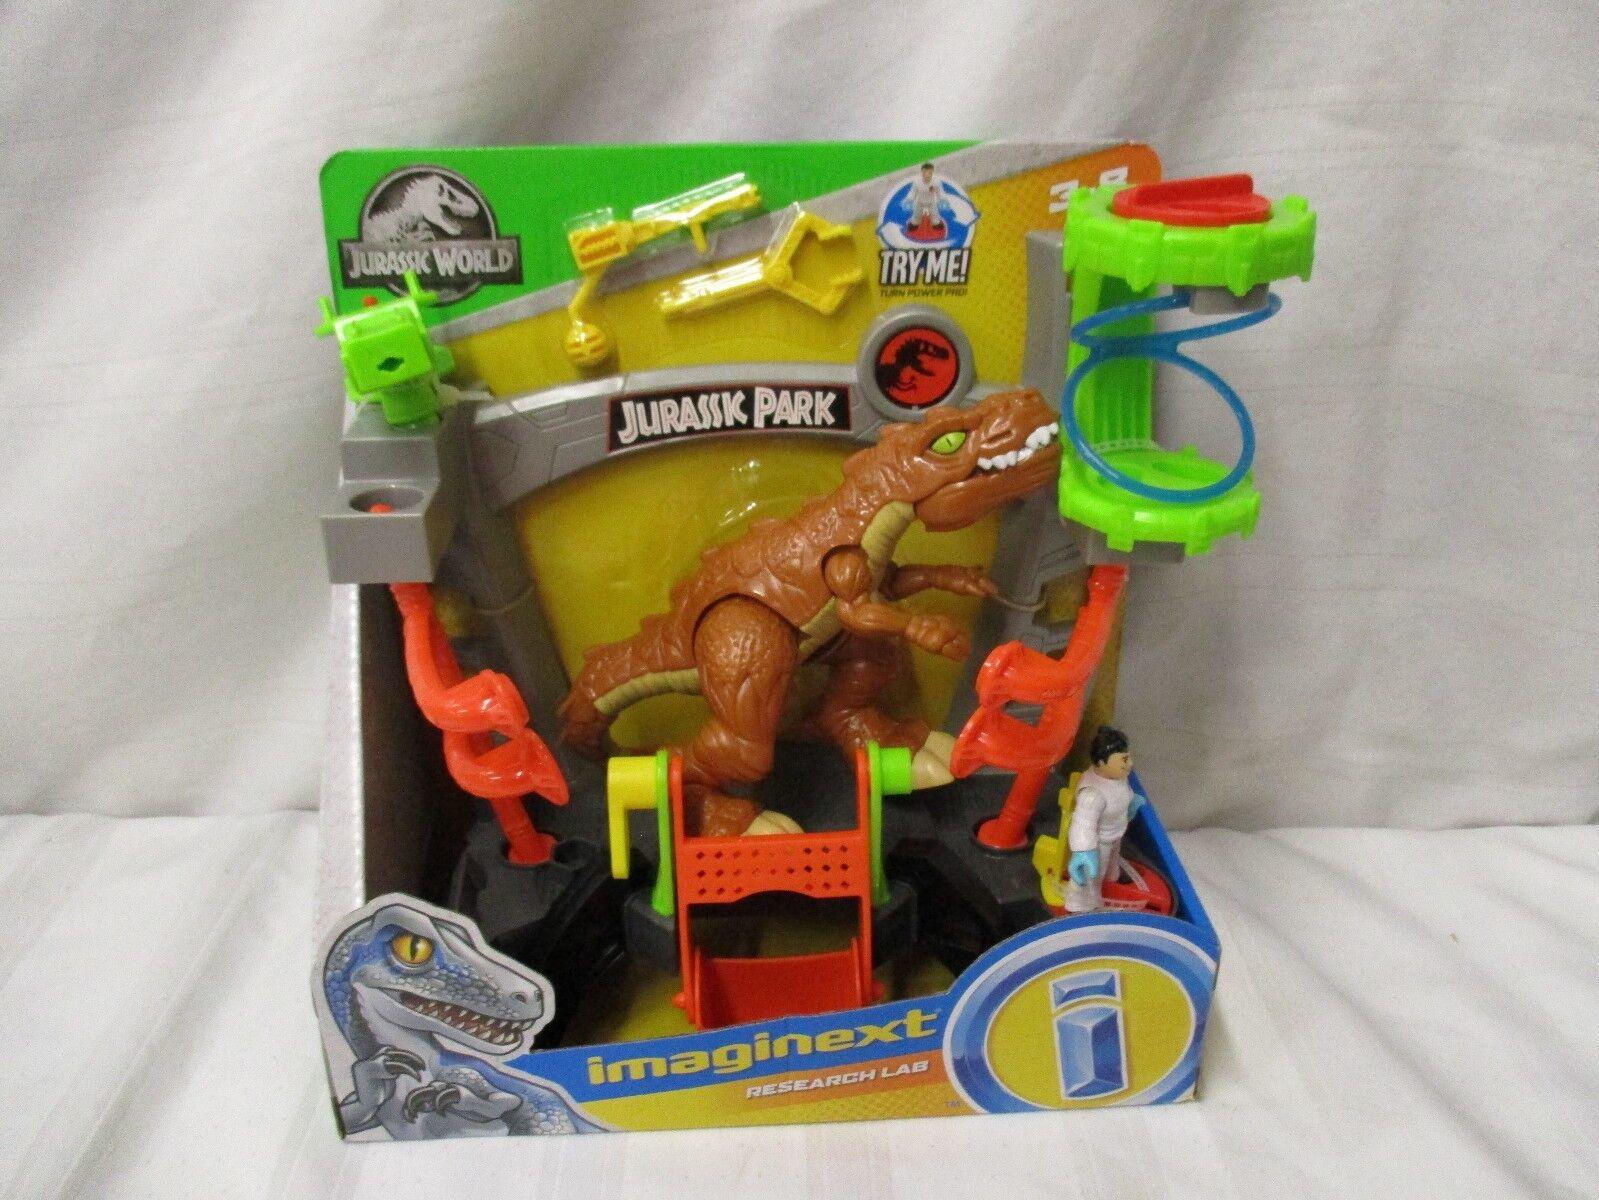 Fisher price Imaginext Jurassic World Dinosaur NEW Research lab park doctor trex